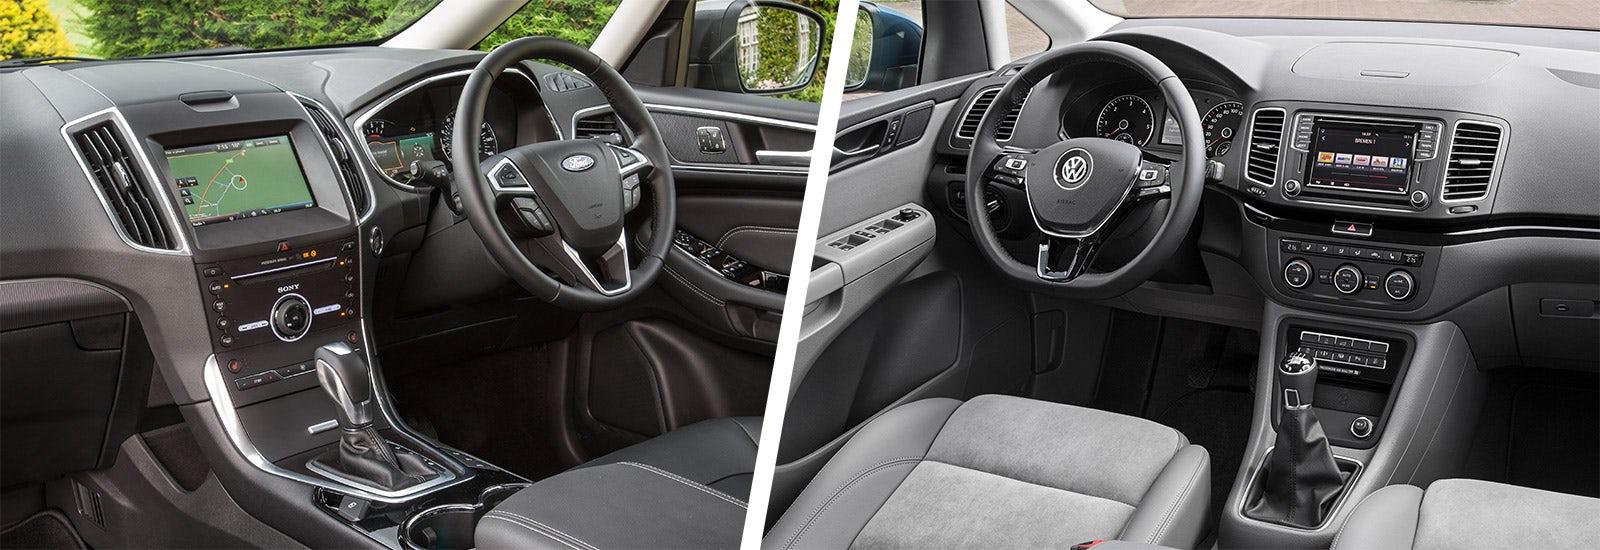 Ford Galaxy vs Volkswagen Sharan MPV comparison | carwow